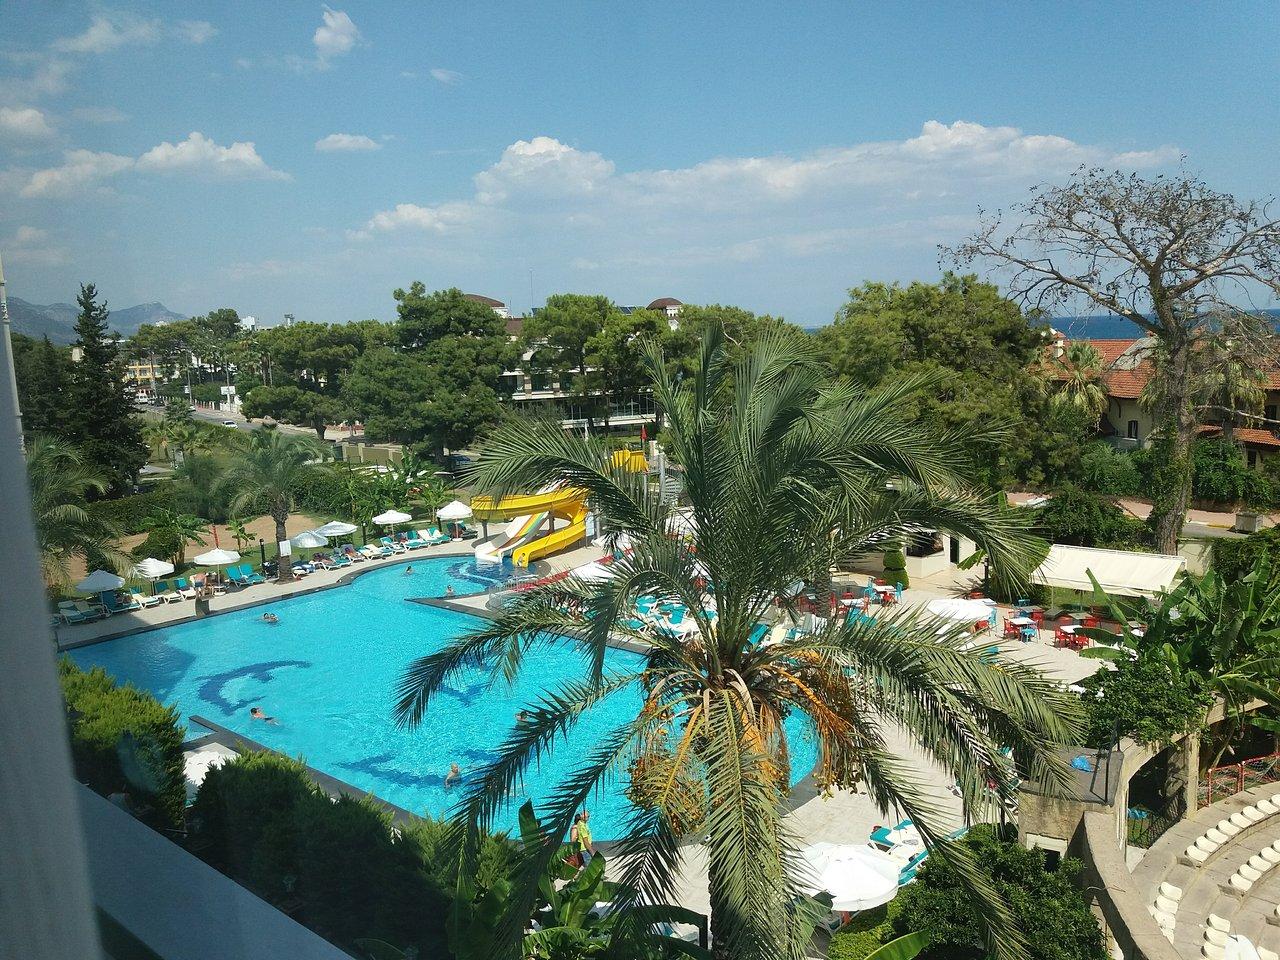 Grand Ring Hotel 5 (Turkey, Kemer, Beldibi): room description, service, beach, reviews 84